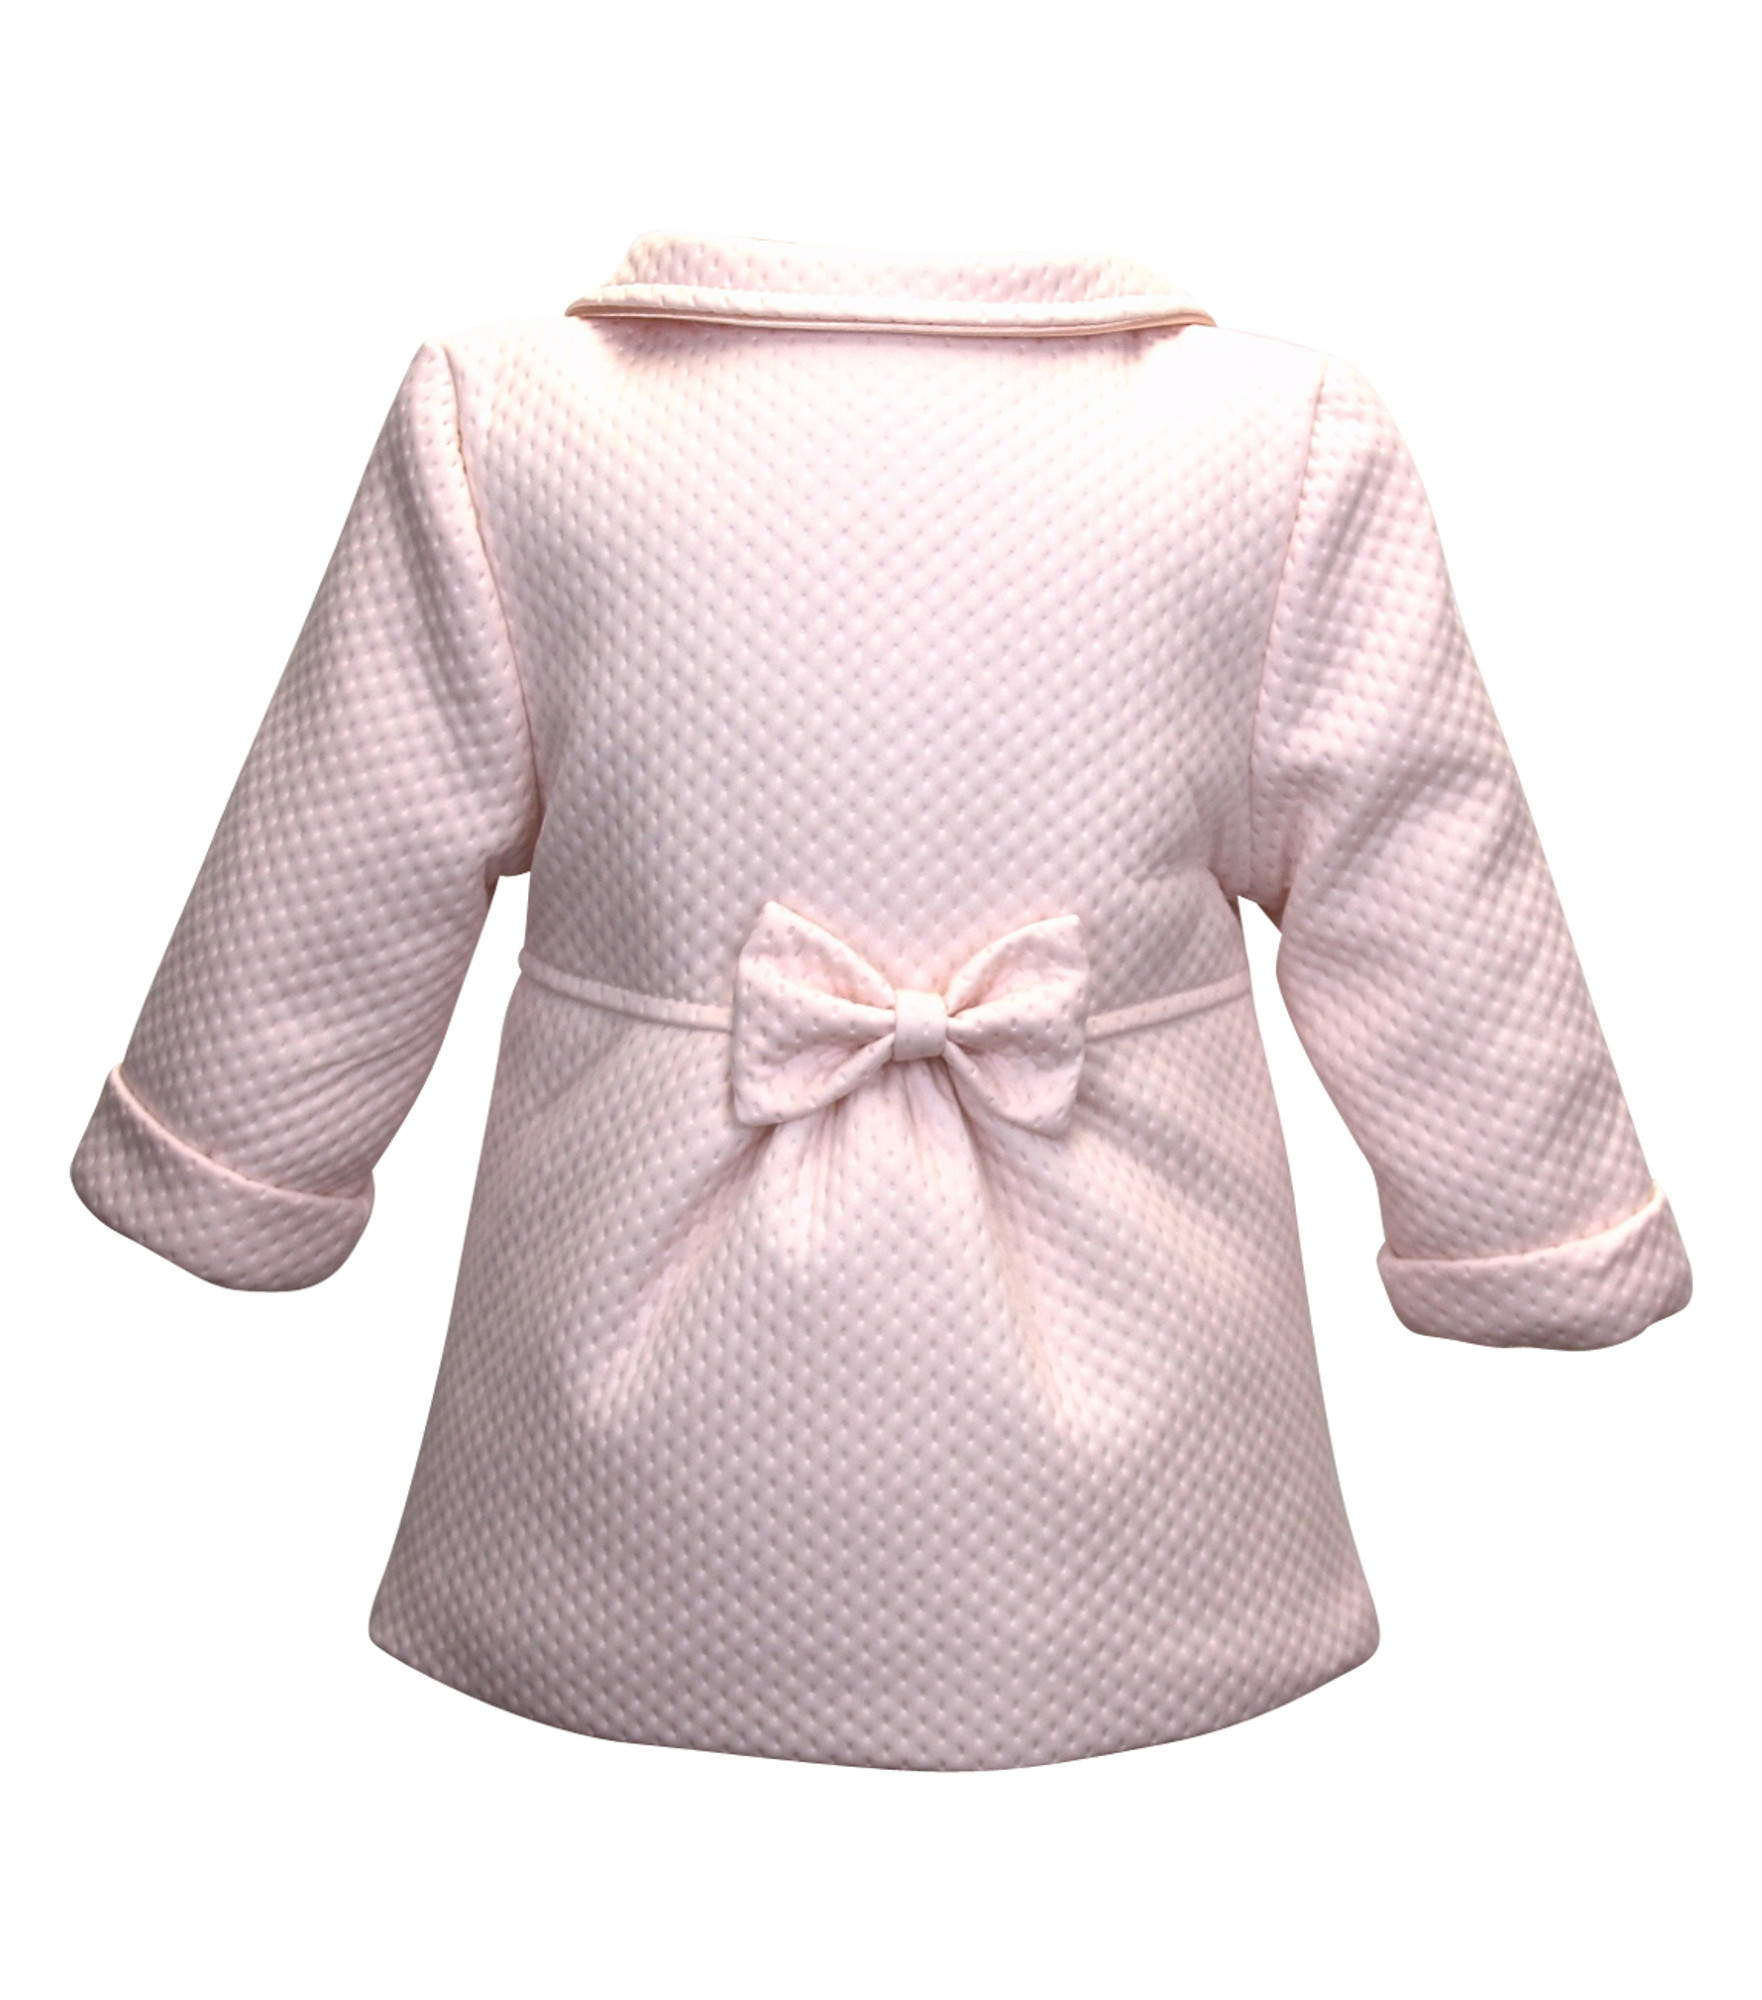 BIMARO Baby Mädchen Babymantel Lea rosa rose Taufmantel Mantel Jacke Baby  Hochzeit Taufe festlich – Bild 6fba00ef1a